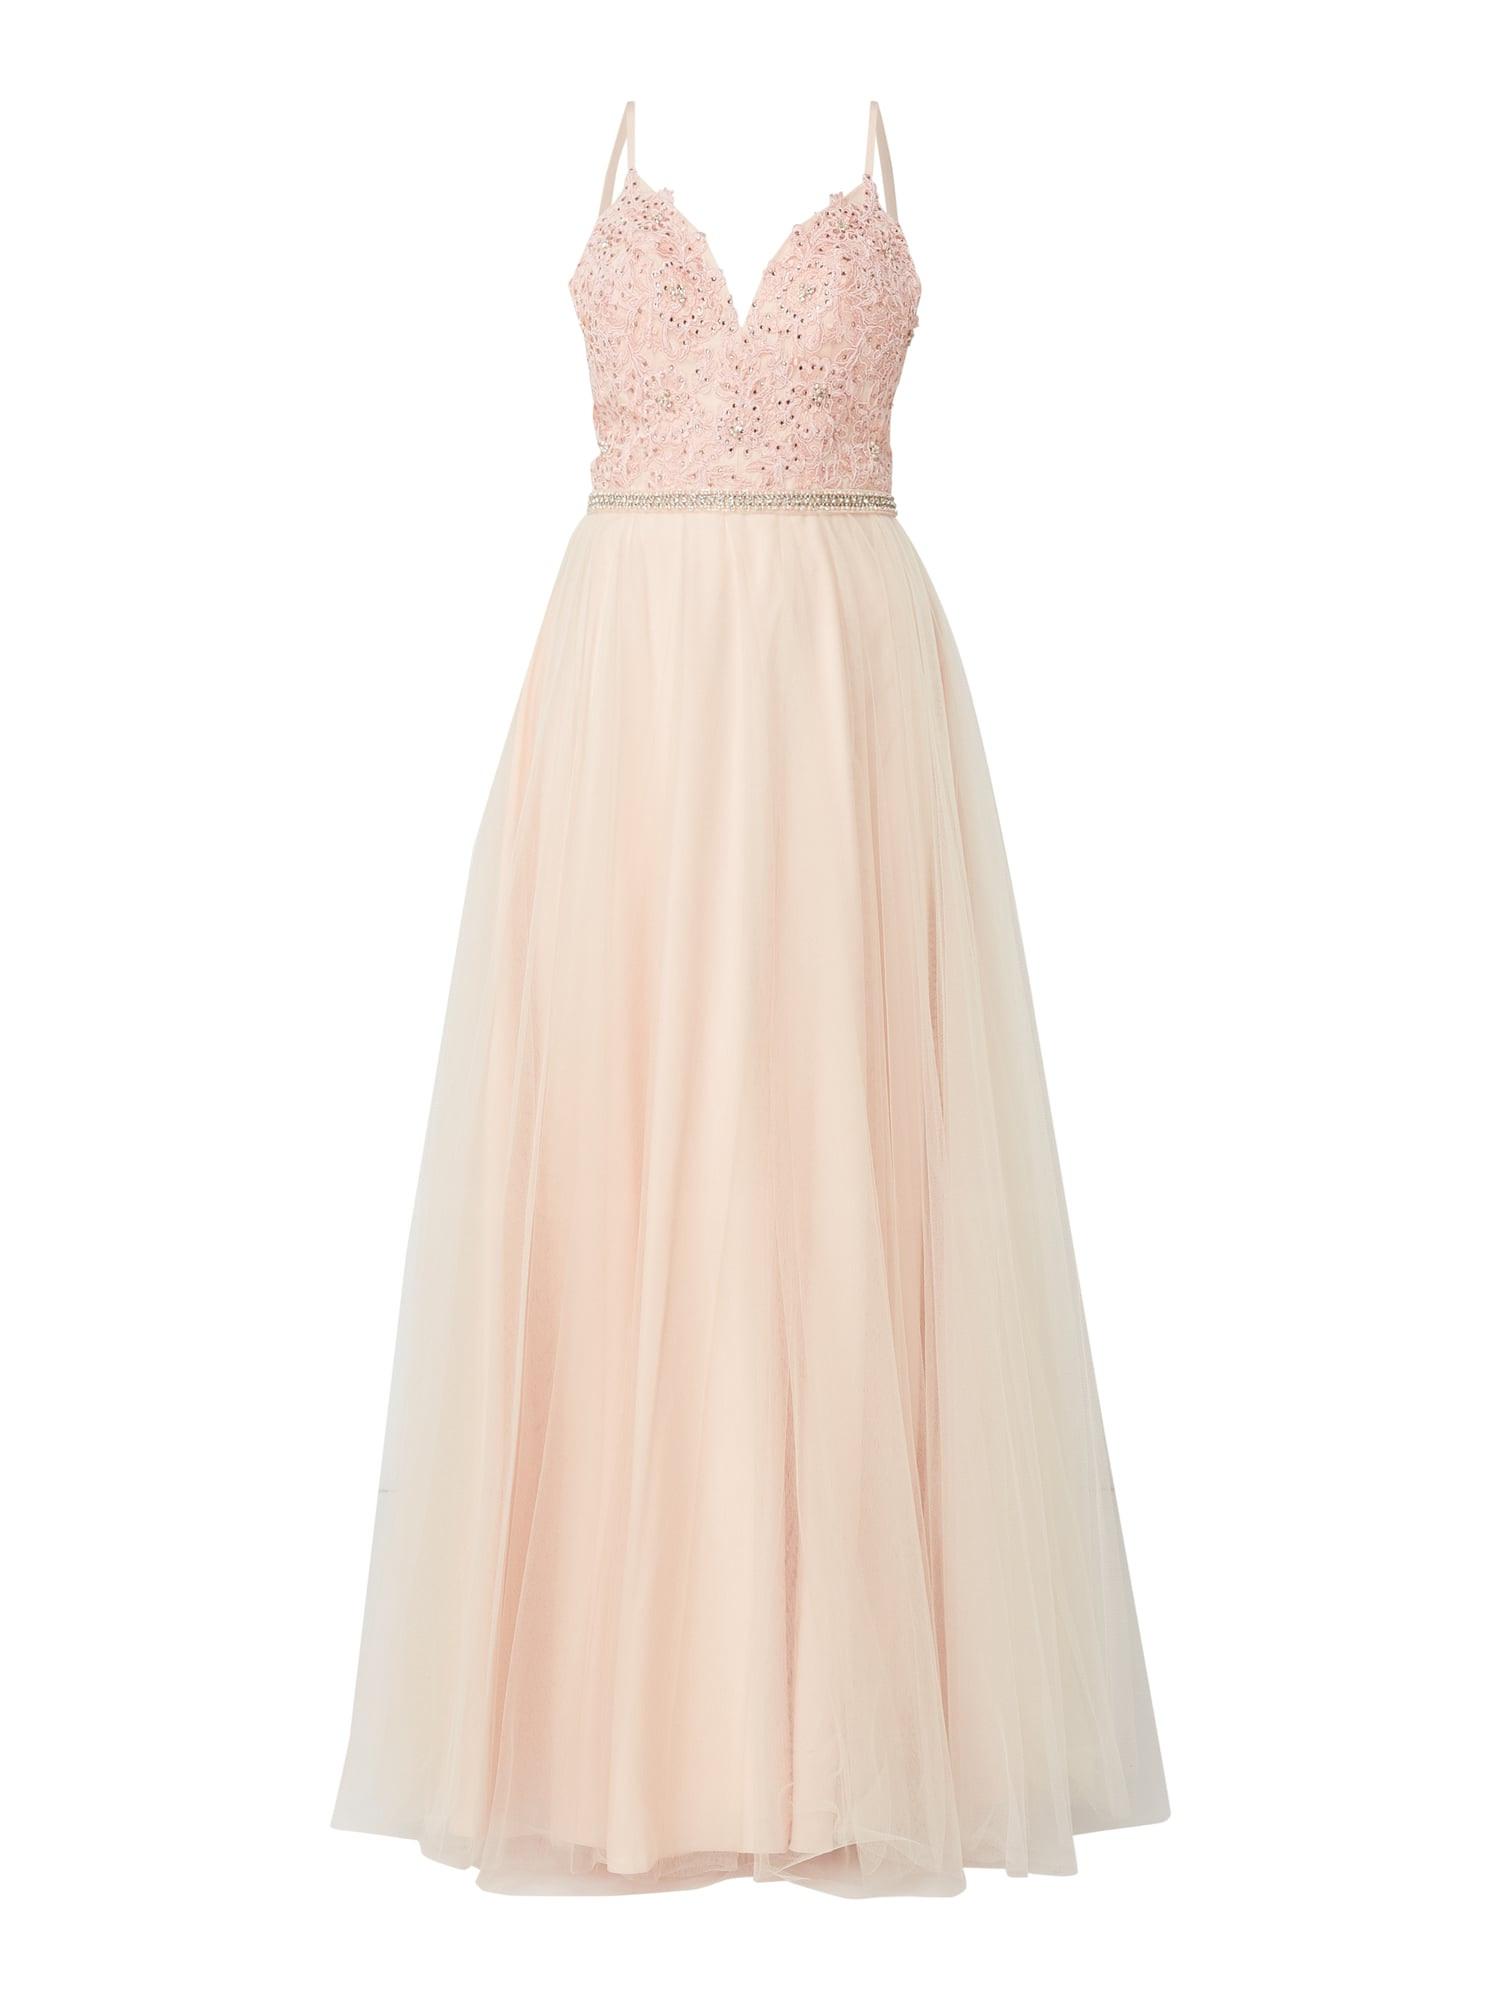 9 Einfach Apricot Abendkleid Boutique - Abendkleid